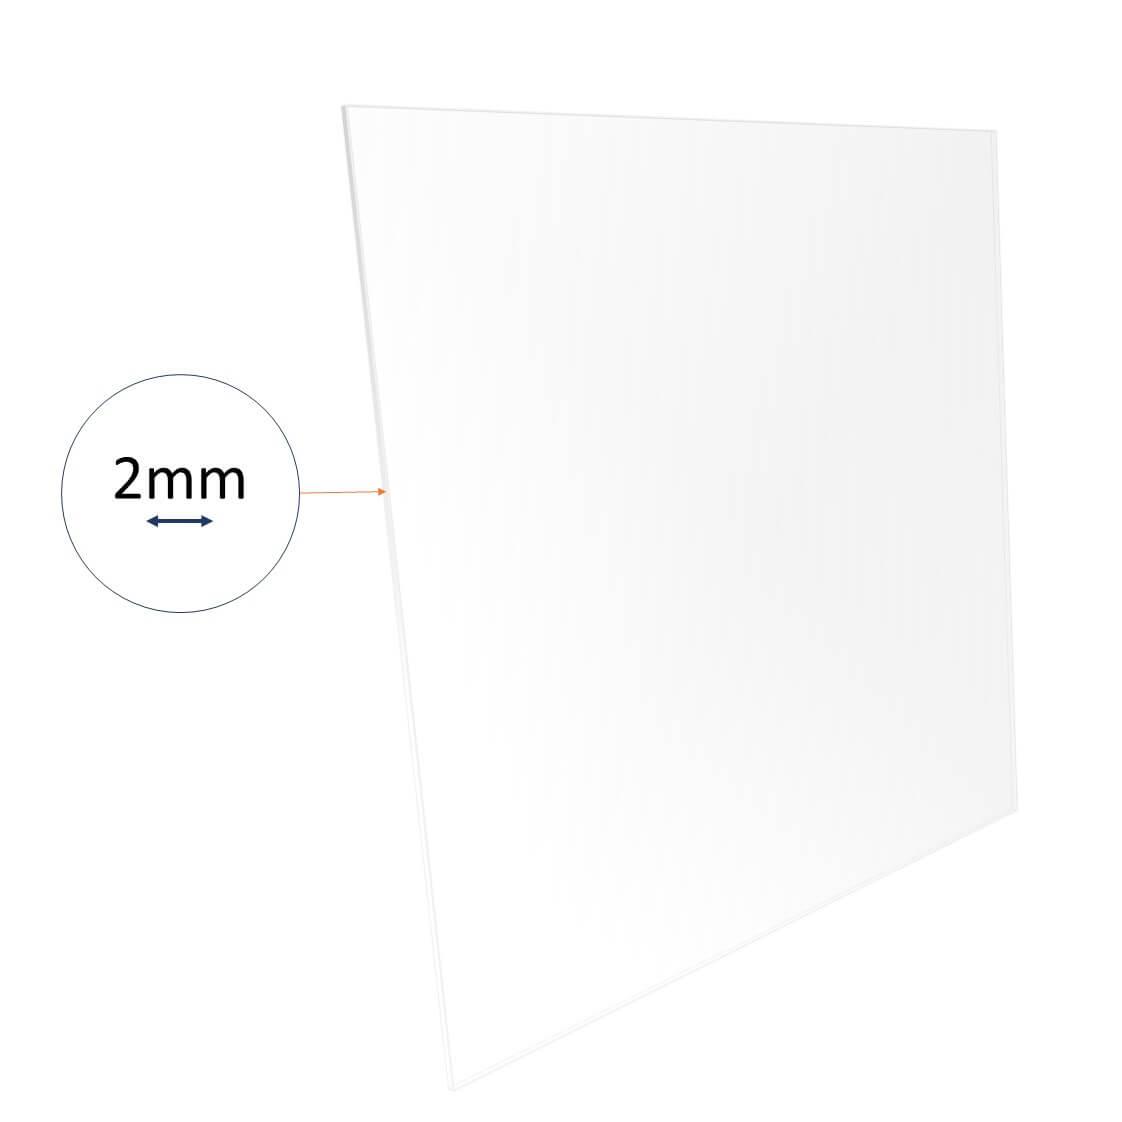 2mm acrylic sheet cut to size